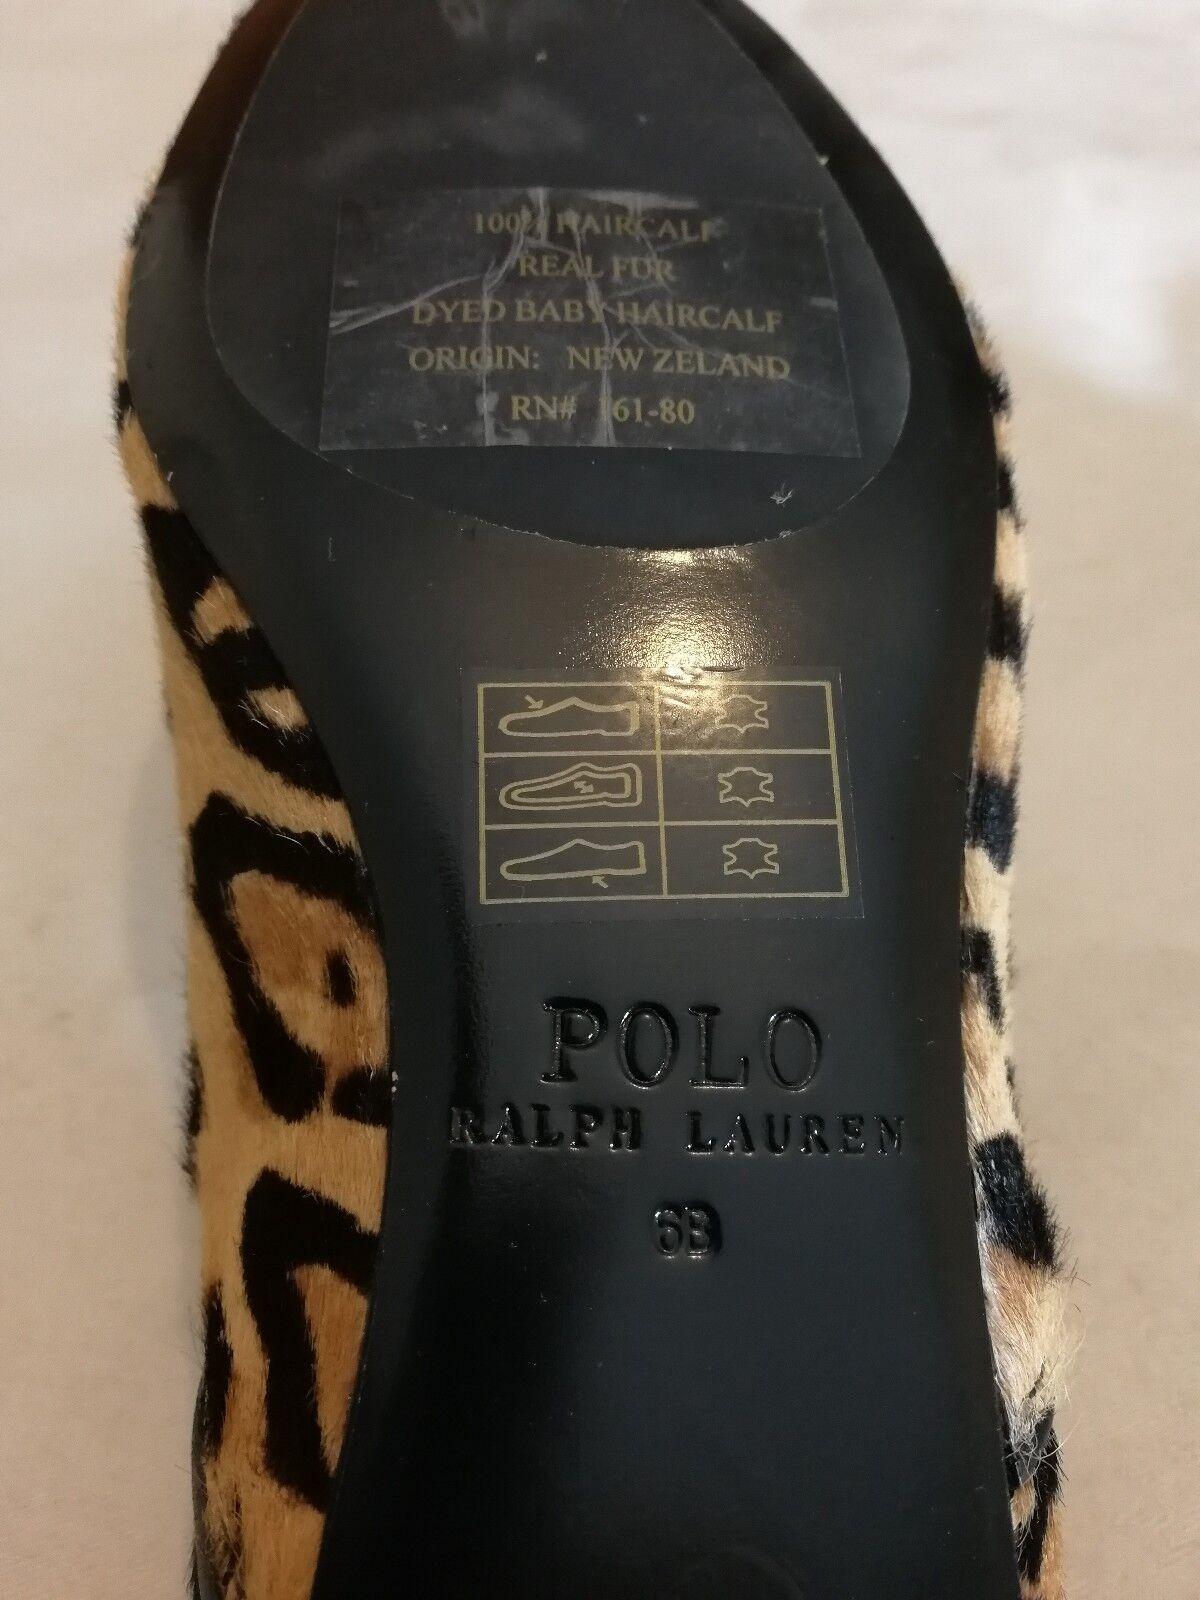 POLO RALPH LAUREN NALA LEOPARD CALFHAIR FLAT eu SHOE Tan Größe uk 4 eu FLAT 37 bc45b8